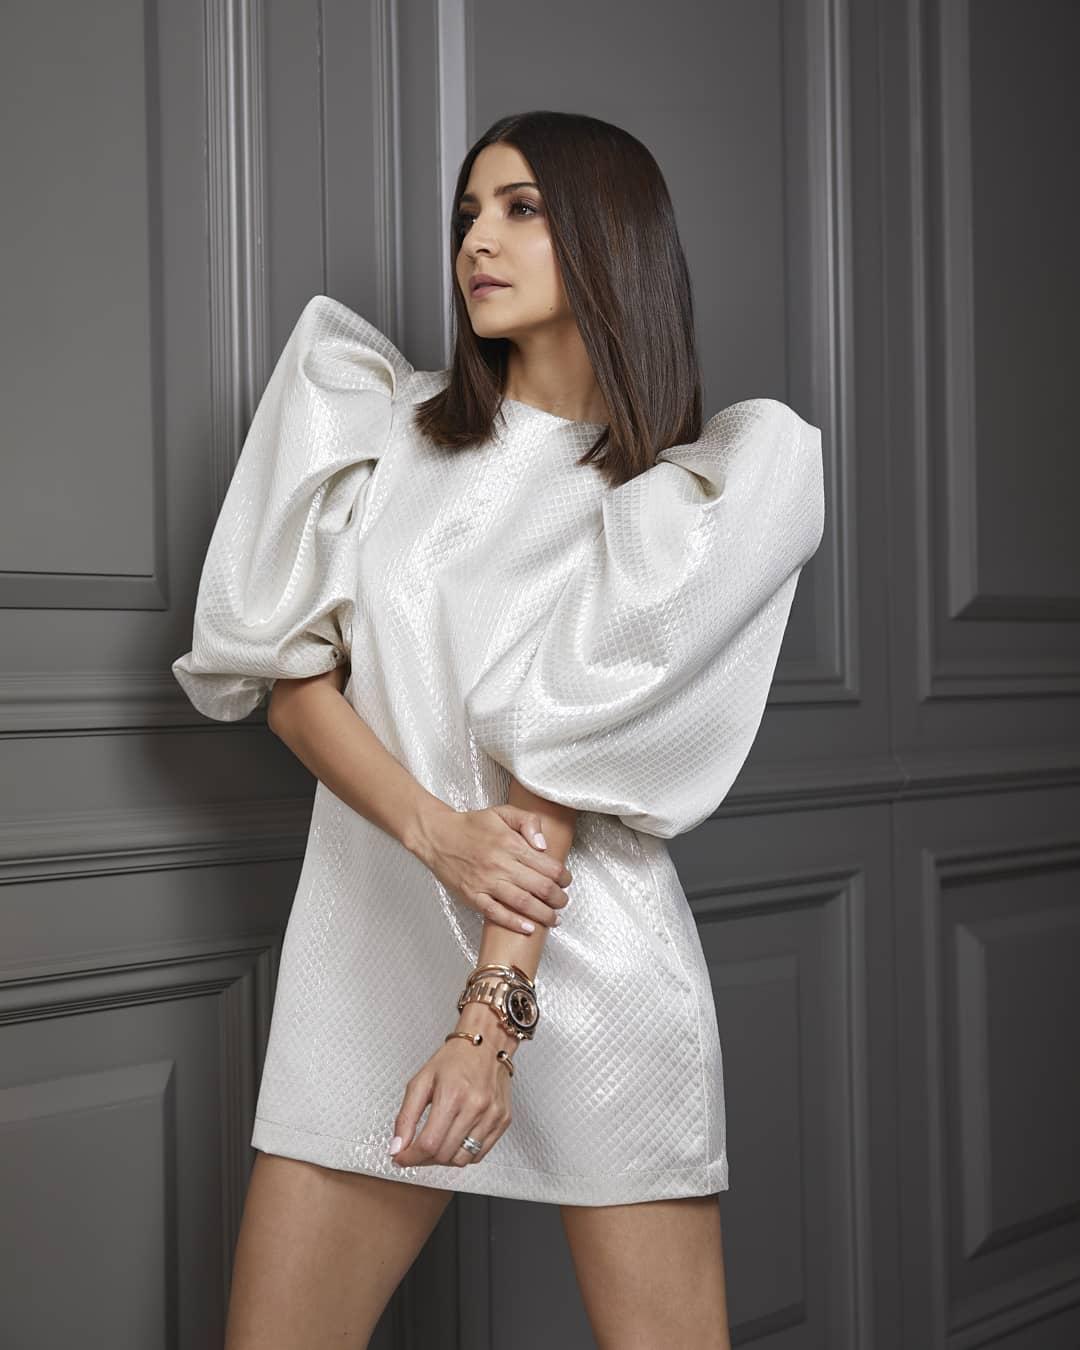 Anushka Sharma Looks Ravishing in White Statement Dress